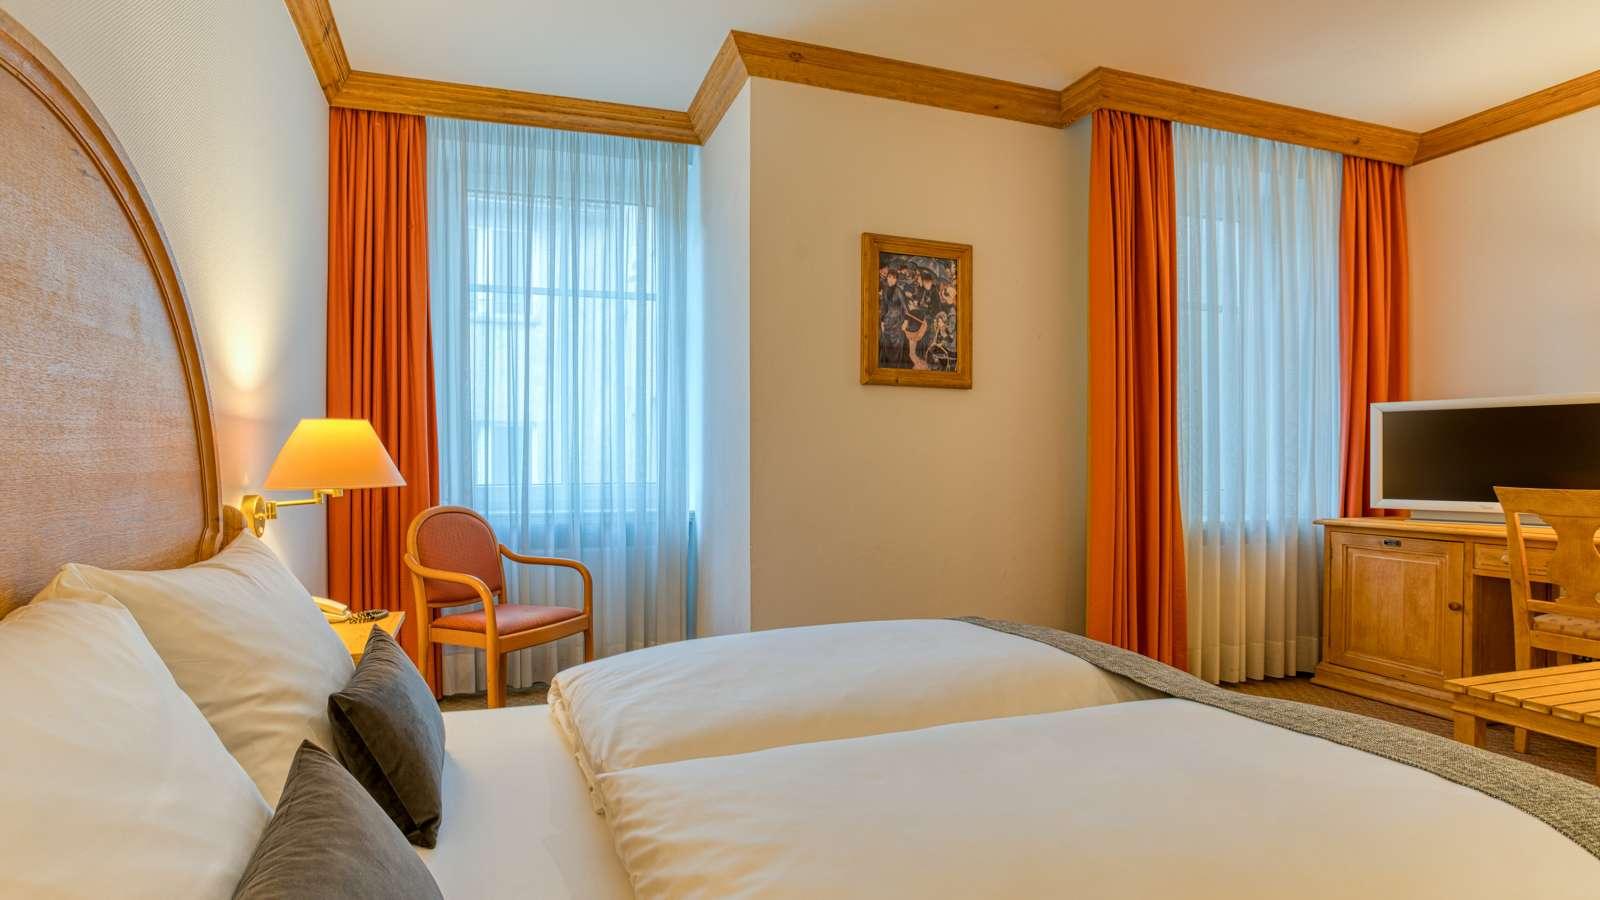 FF&E Hotel Ravensberger Hof in Bielefeld